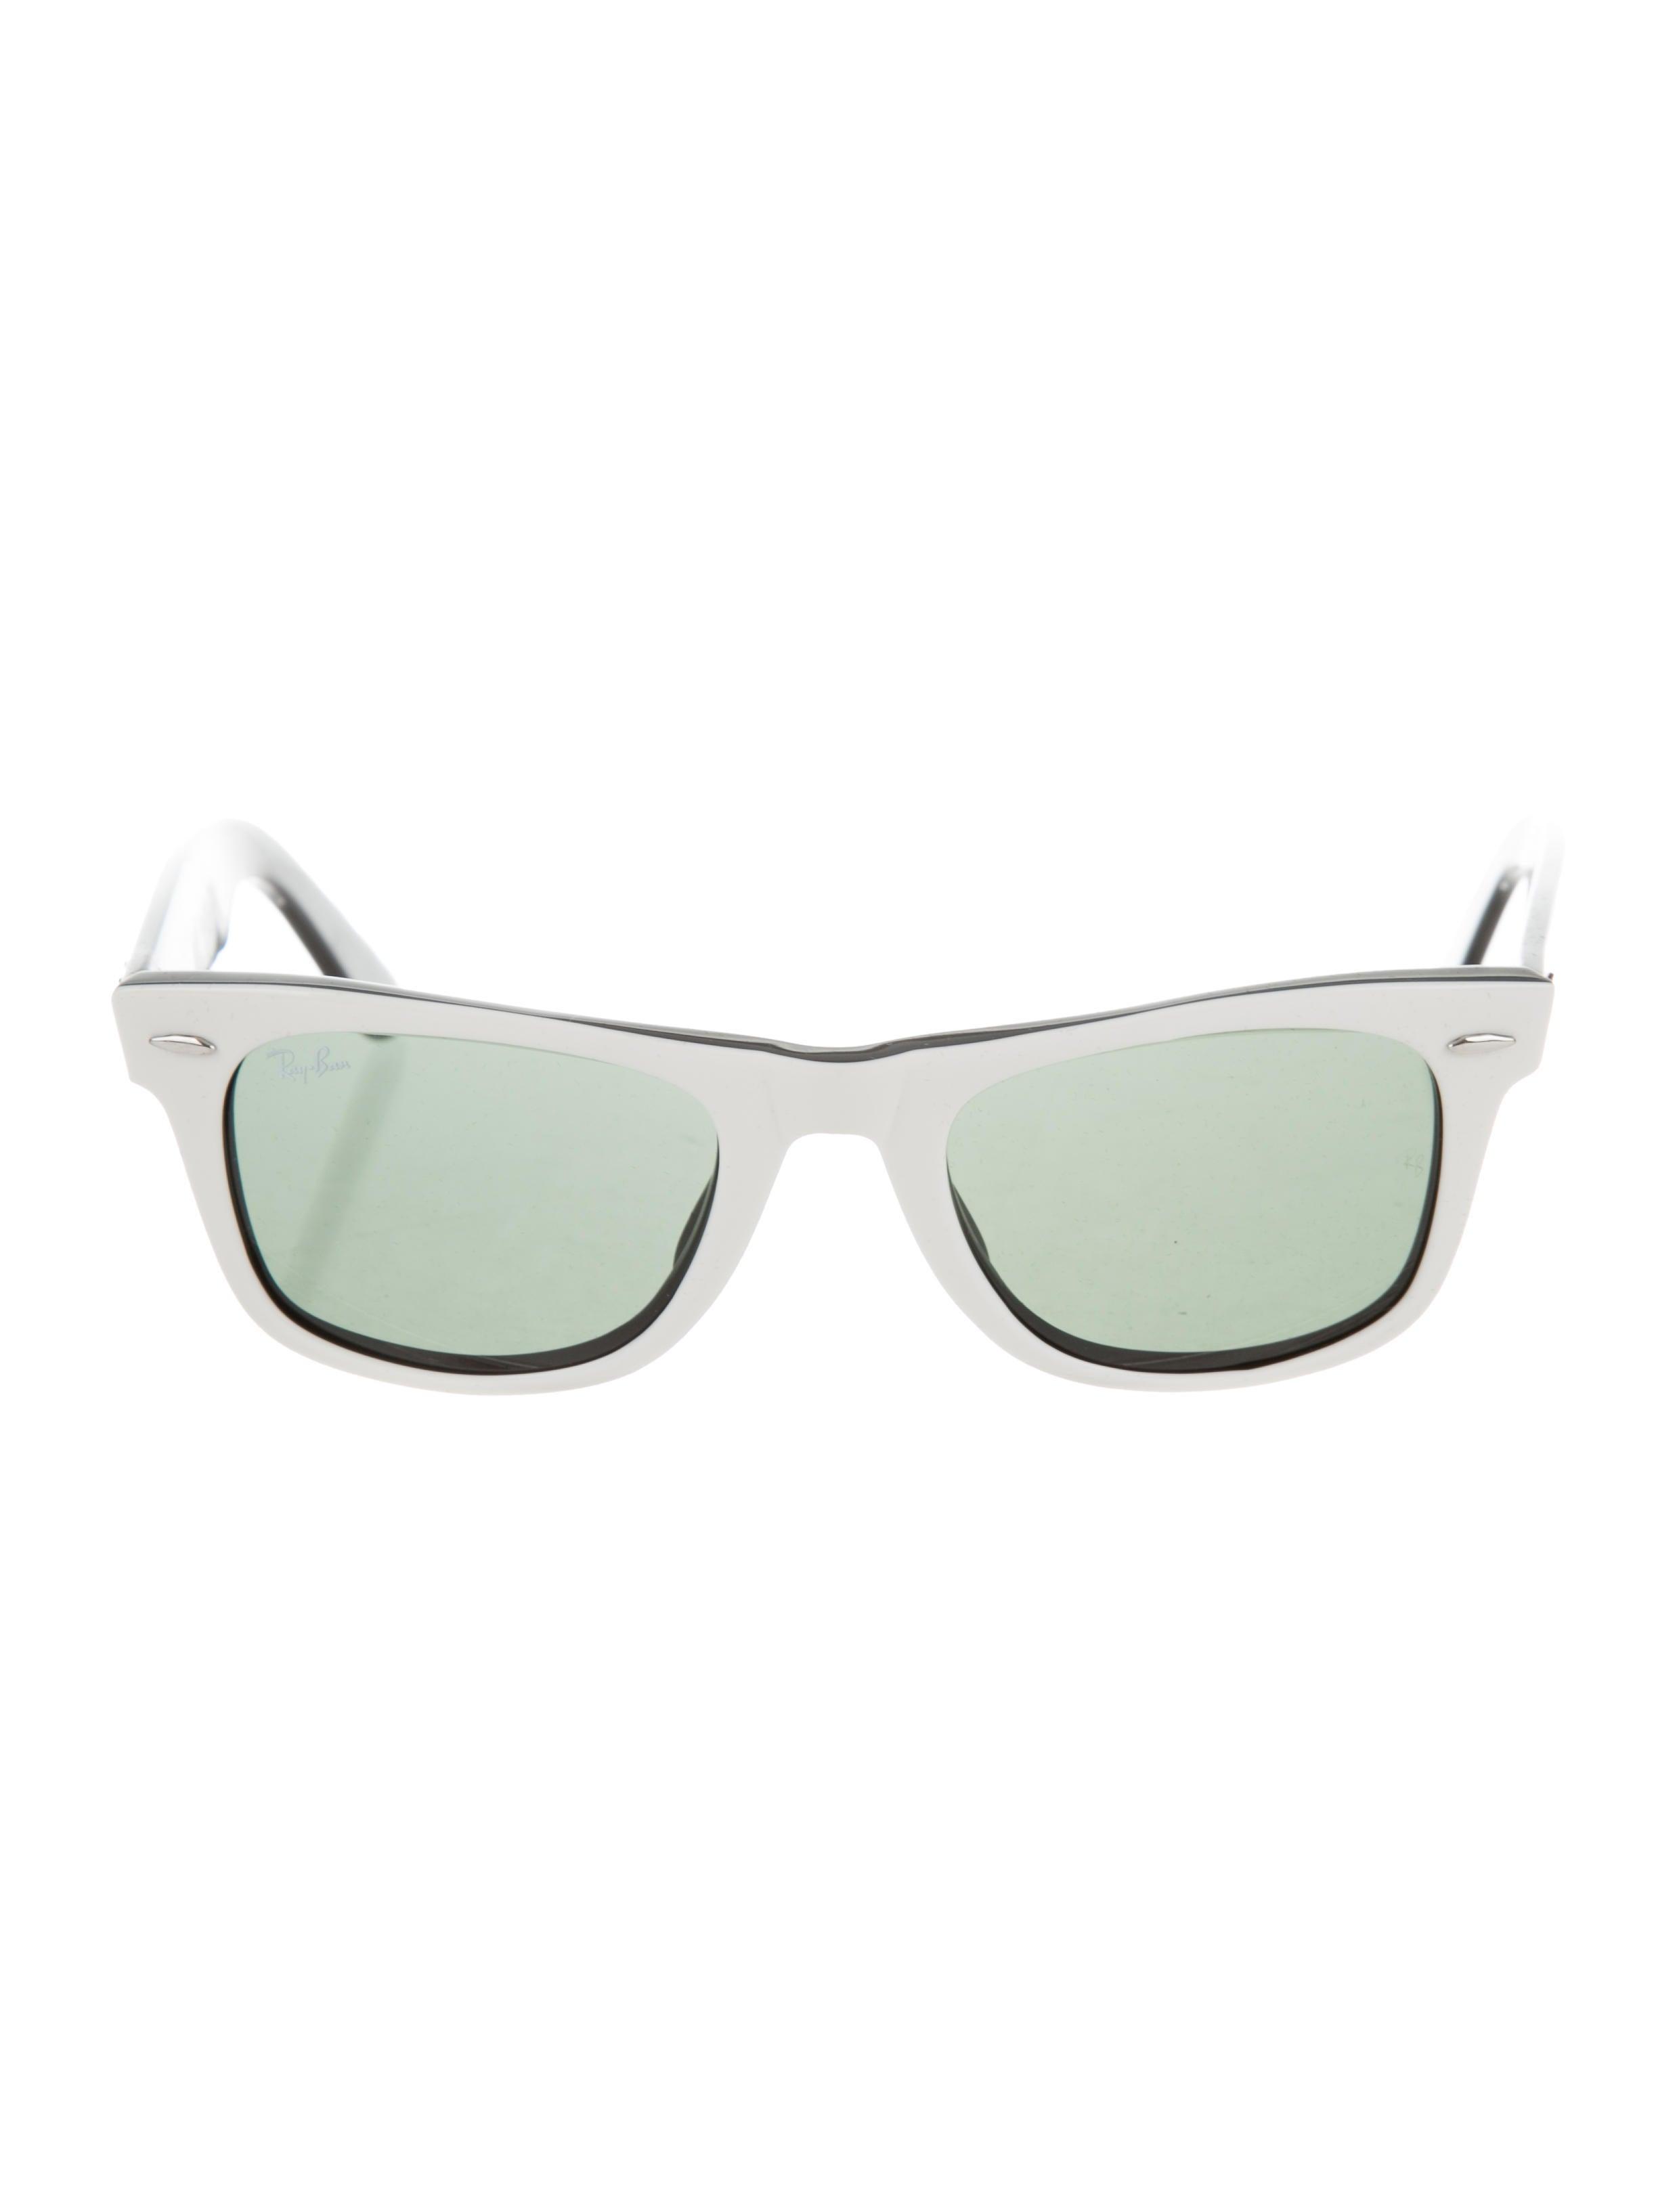 efb62ca3c5ec Ray-Ban Wayfarer Tinted Sunglasses - Accessories - WRX31412